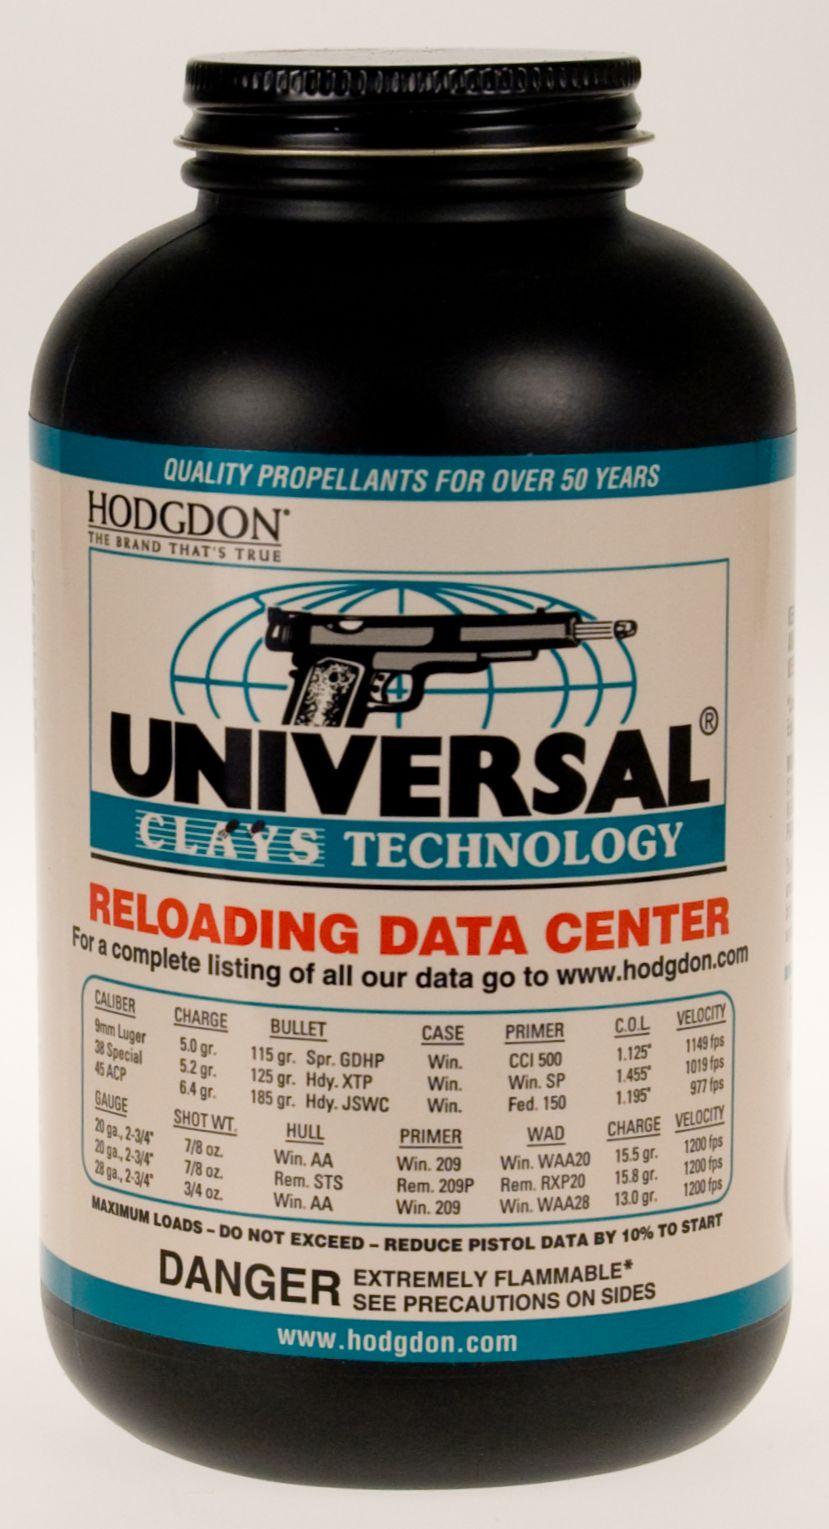 Hodgdon Universal Clays ruuti (454g)